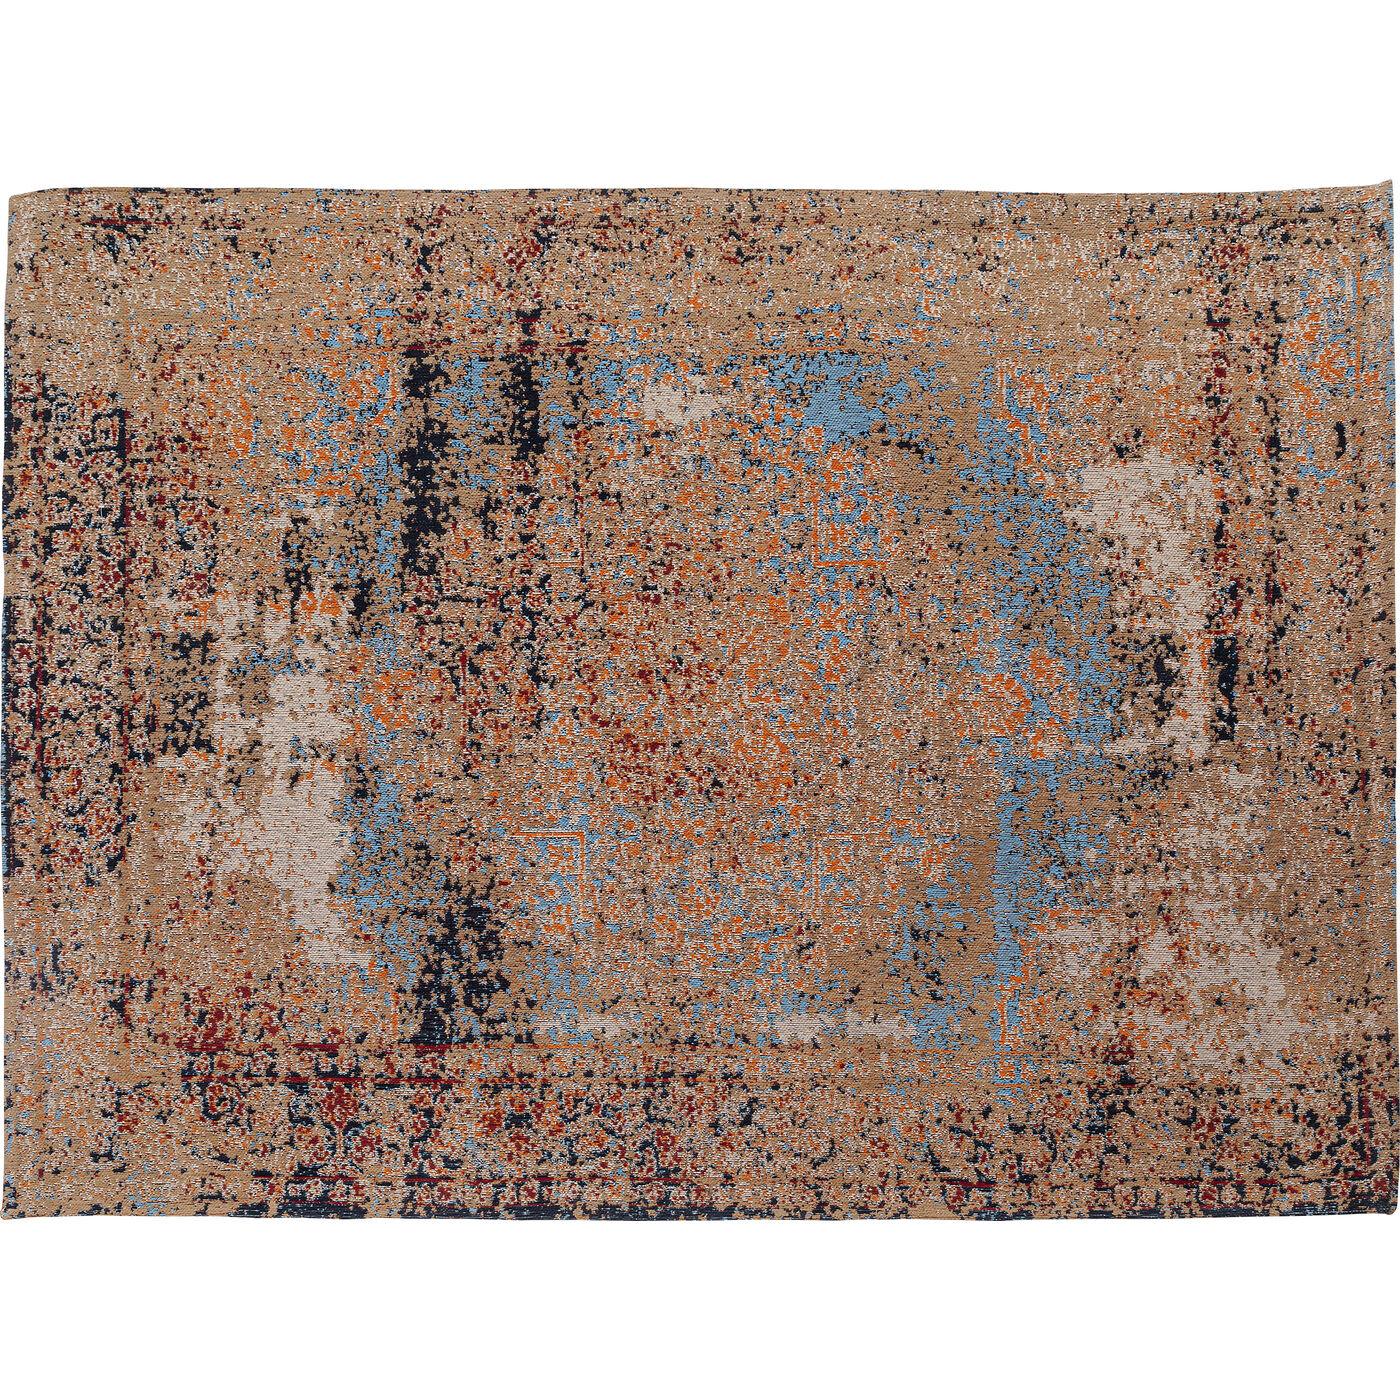 Teppich Safi 240x170